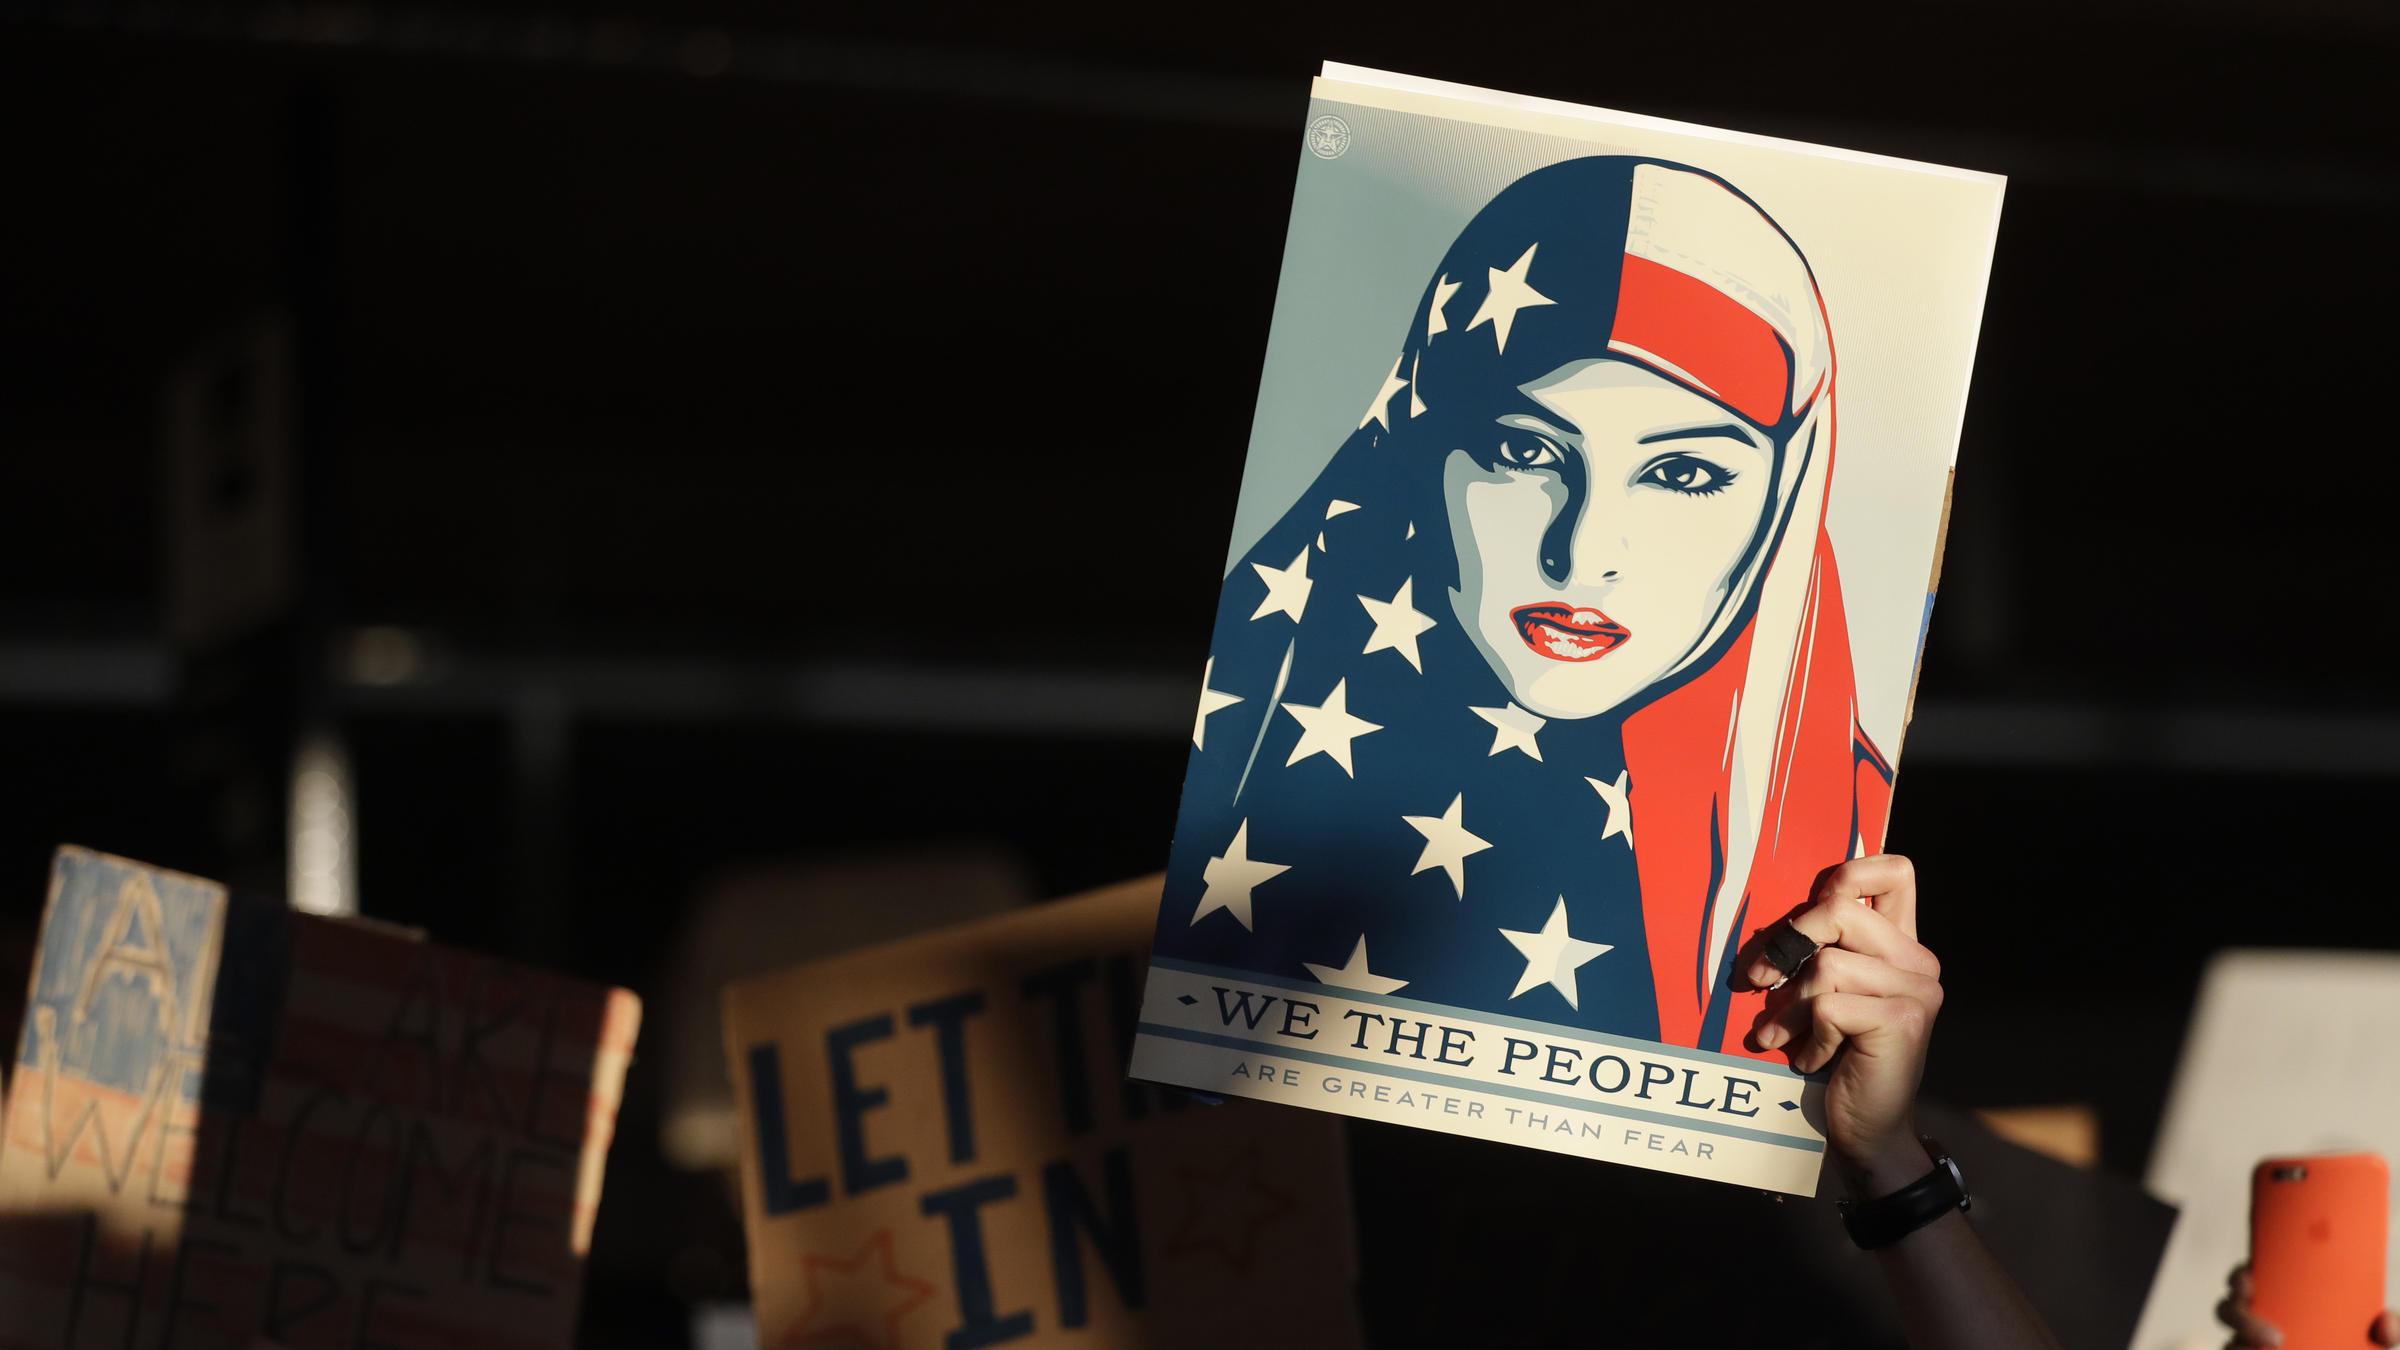 Muslim dating site npr morning